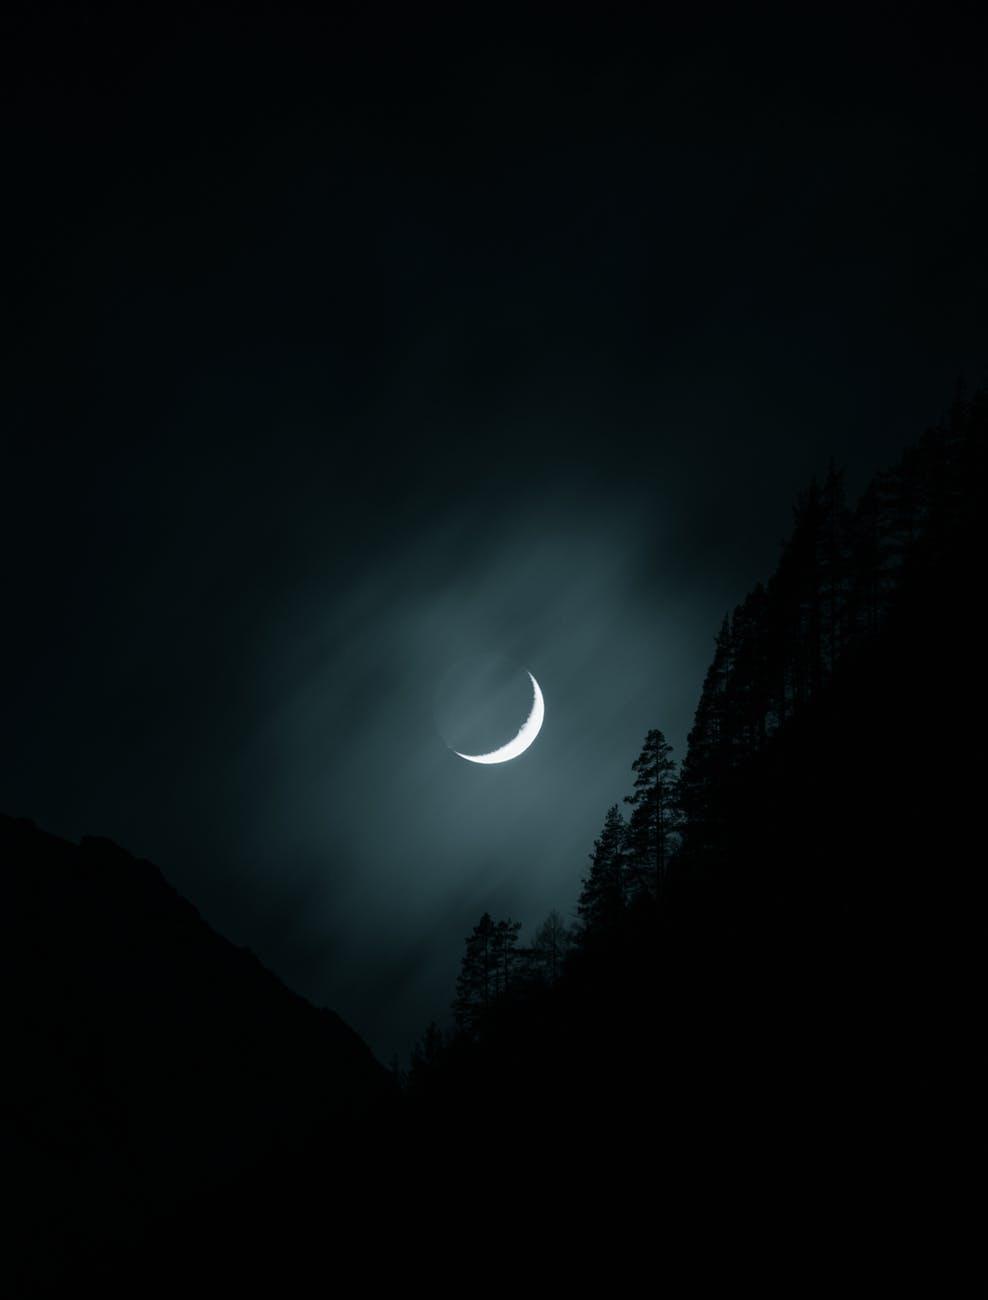 photo of moon on a dark sky